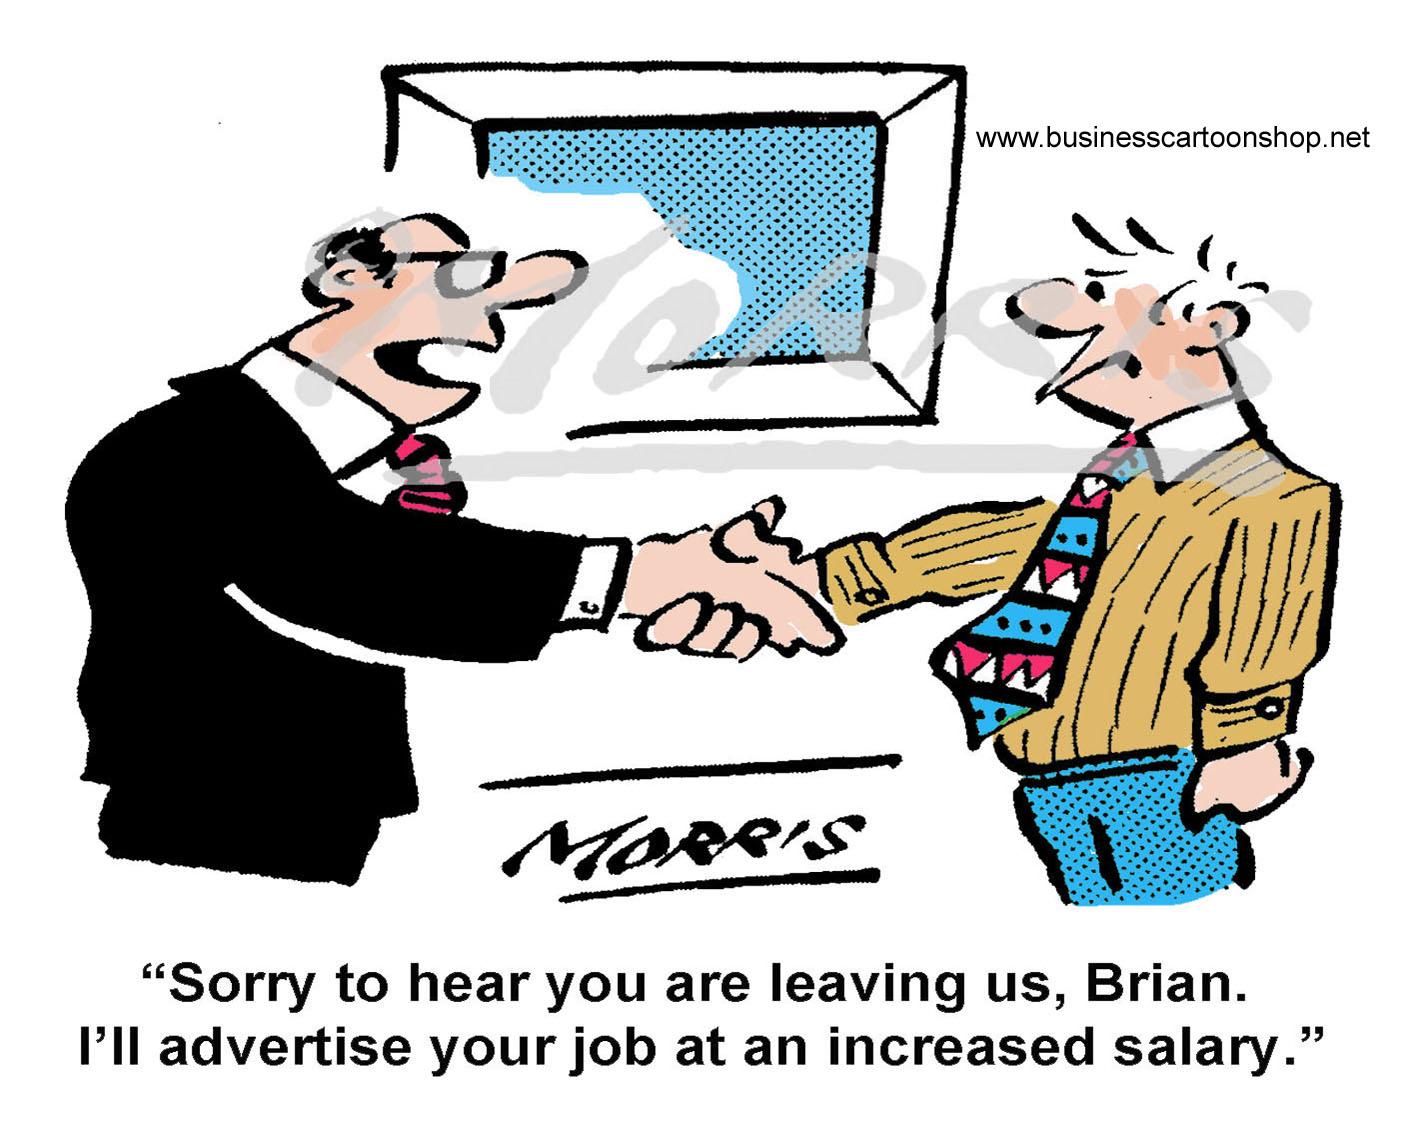 free cartoon, free business cartoons, hr cartoons, human resource cartoon, management cartoon, management cartoons, advertising cartoon,office cartoons